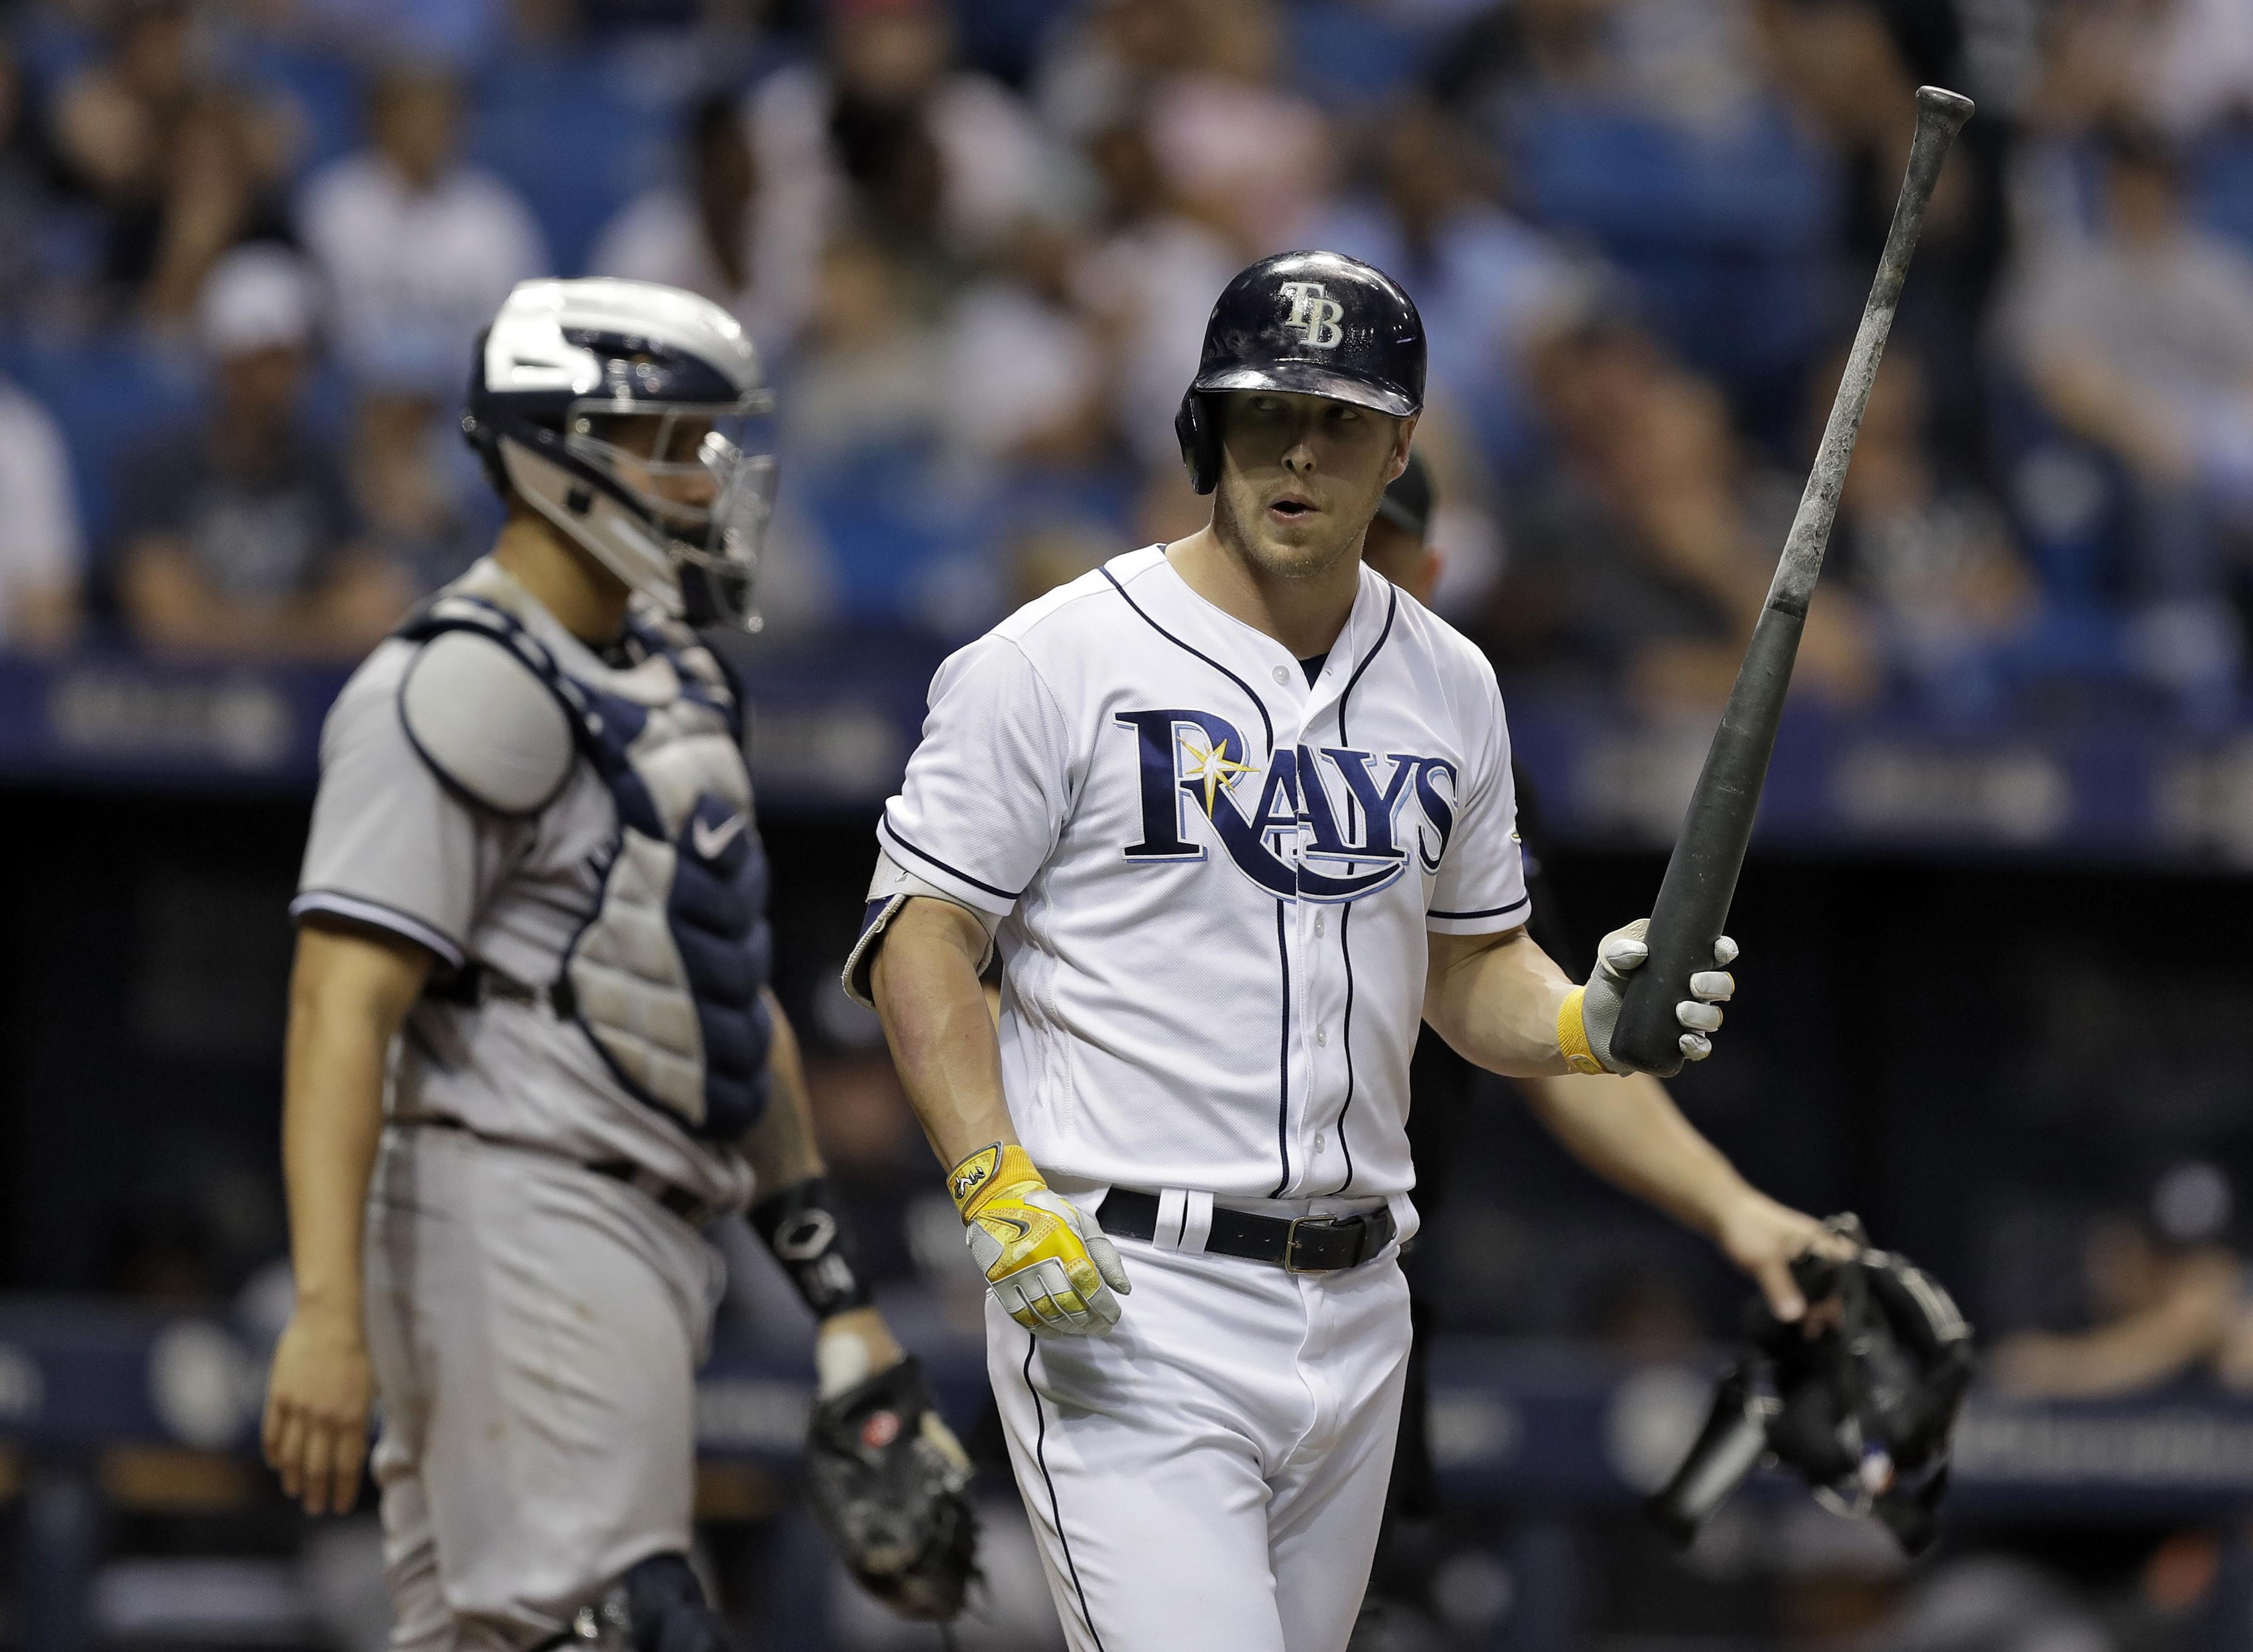 Yankees_rays_baseball_60029